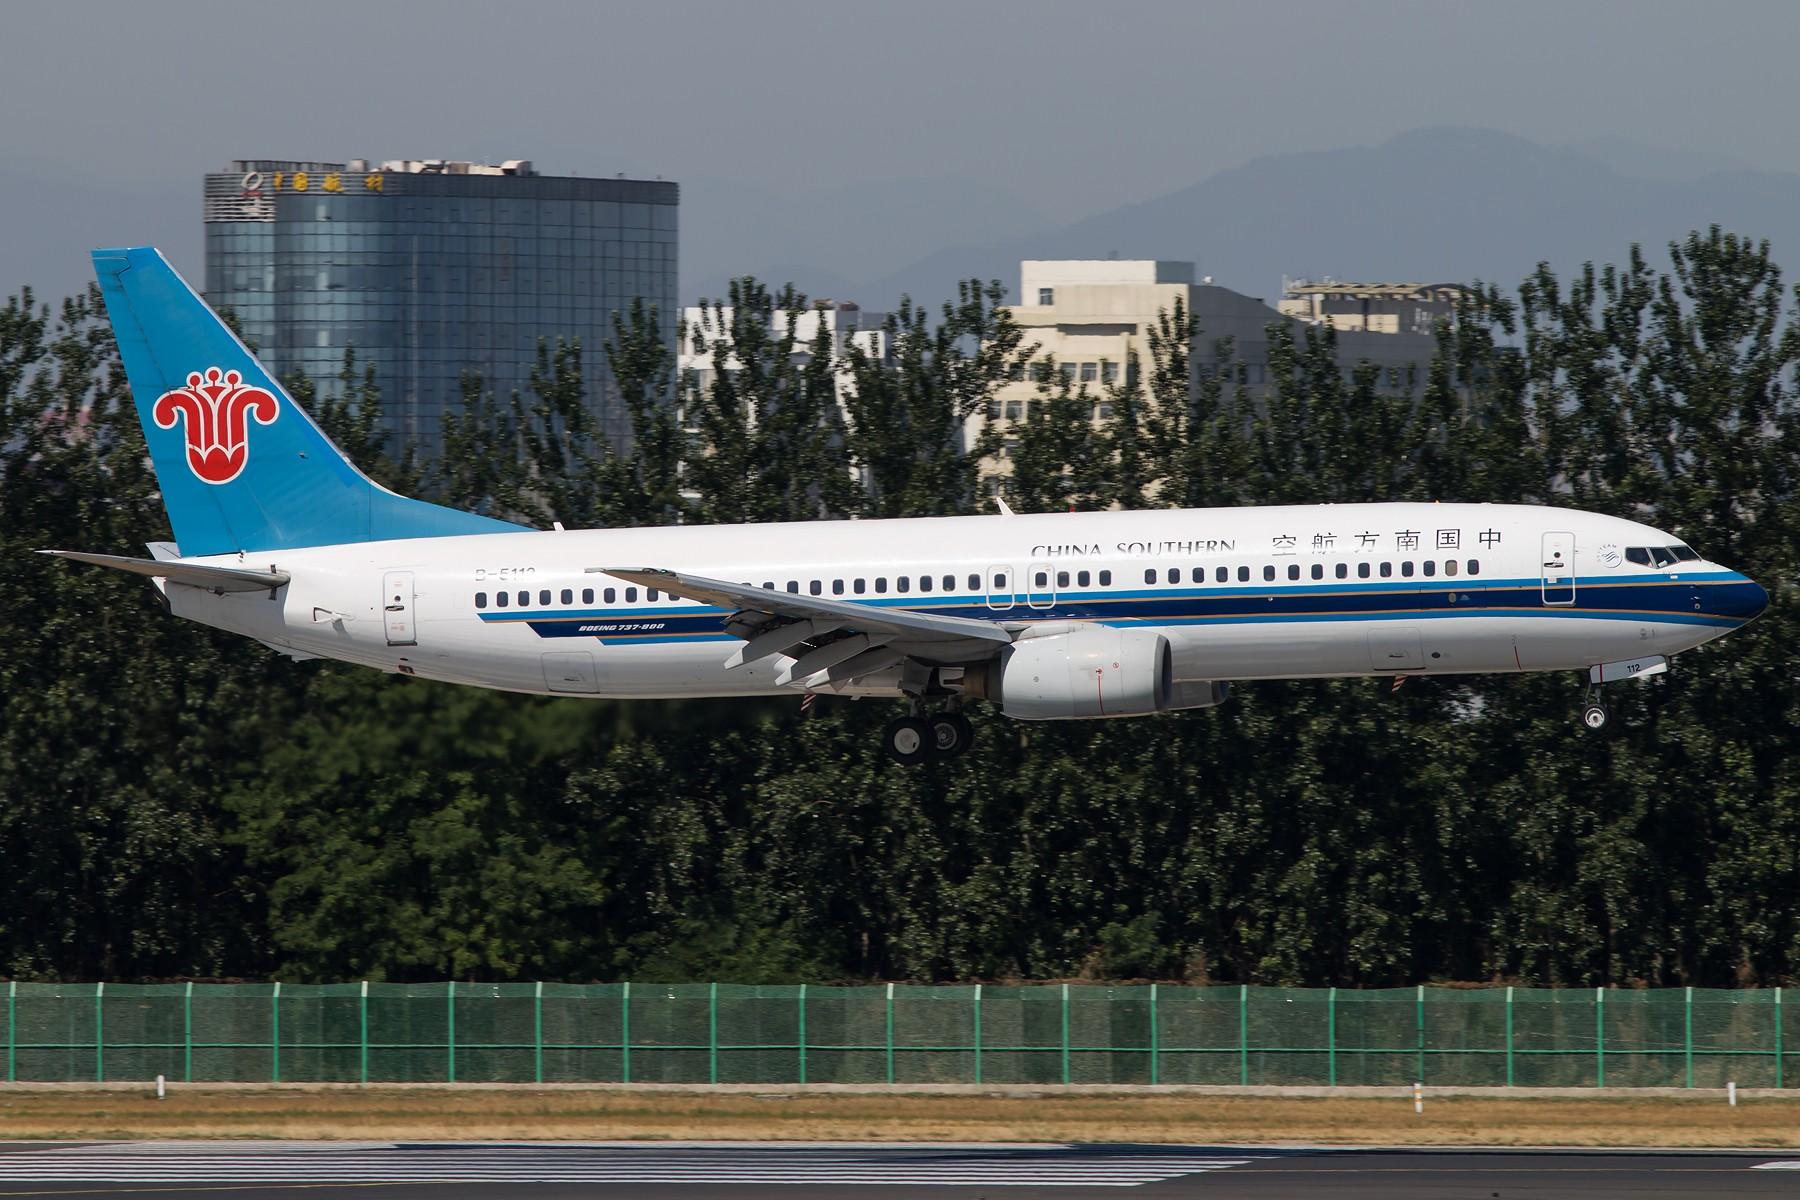 Re:[原创]三大航普通装 1800*1200 [10pics] BOEING 737-800 B-5112 中国北京首都国际机场